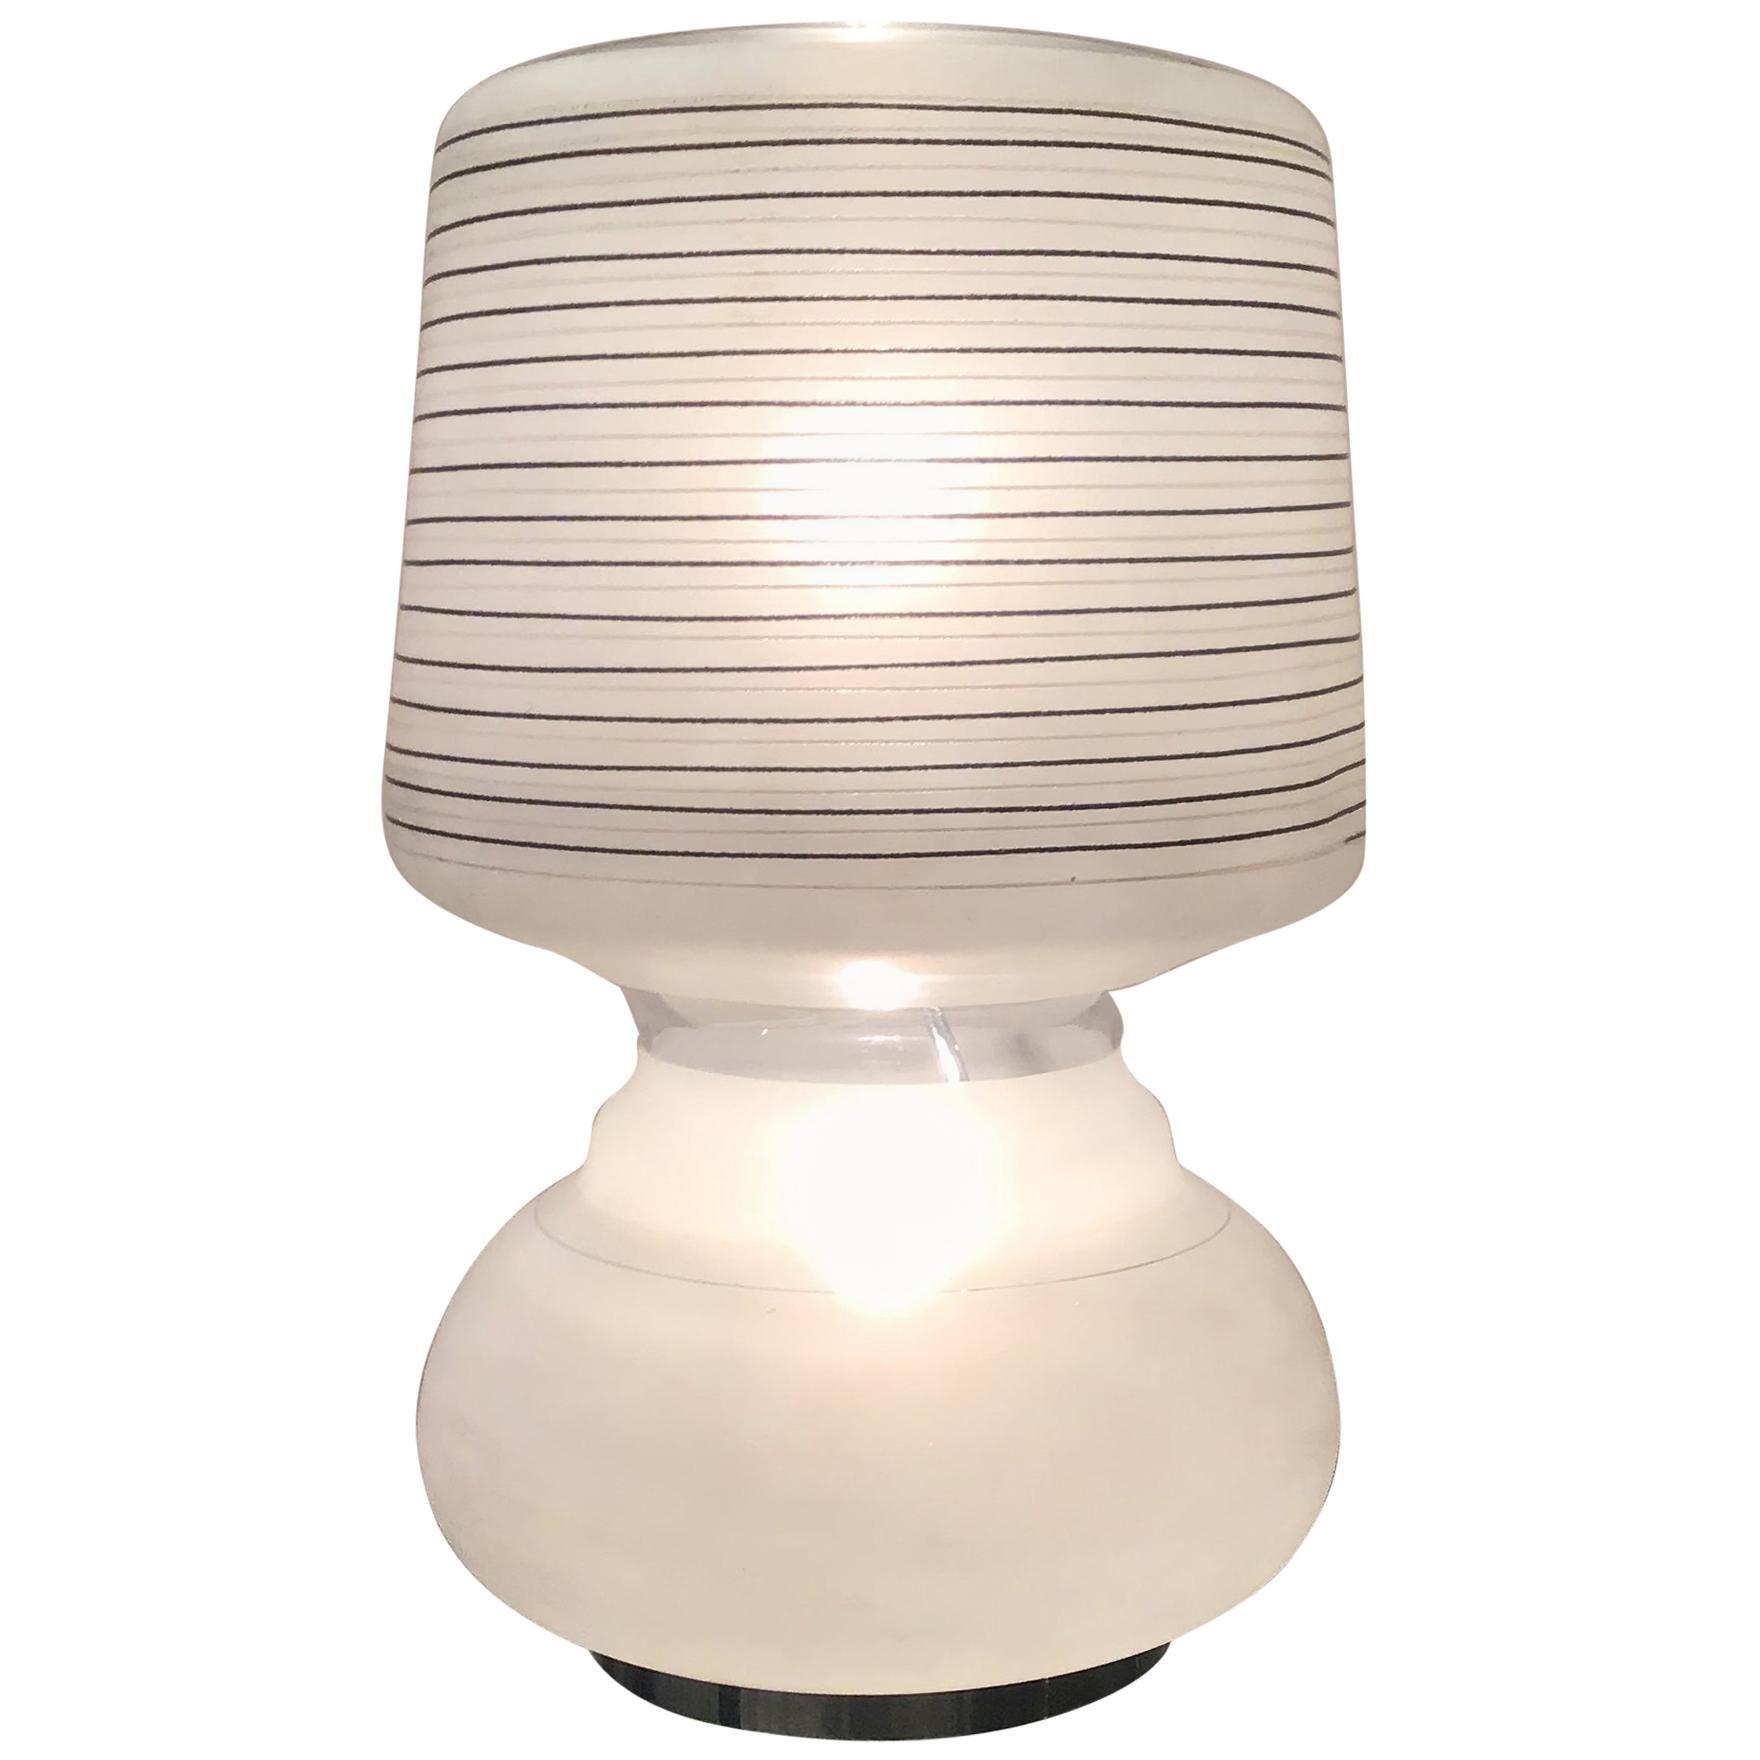 Cristal Arte Table Lamp Glass Metal, 1970, Italy